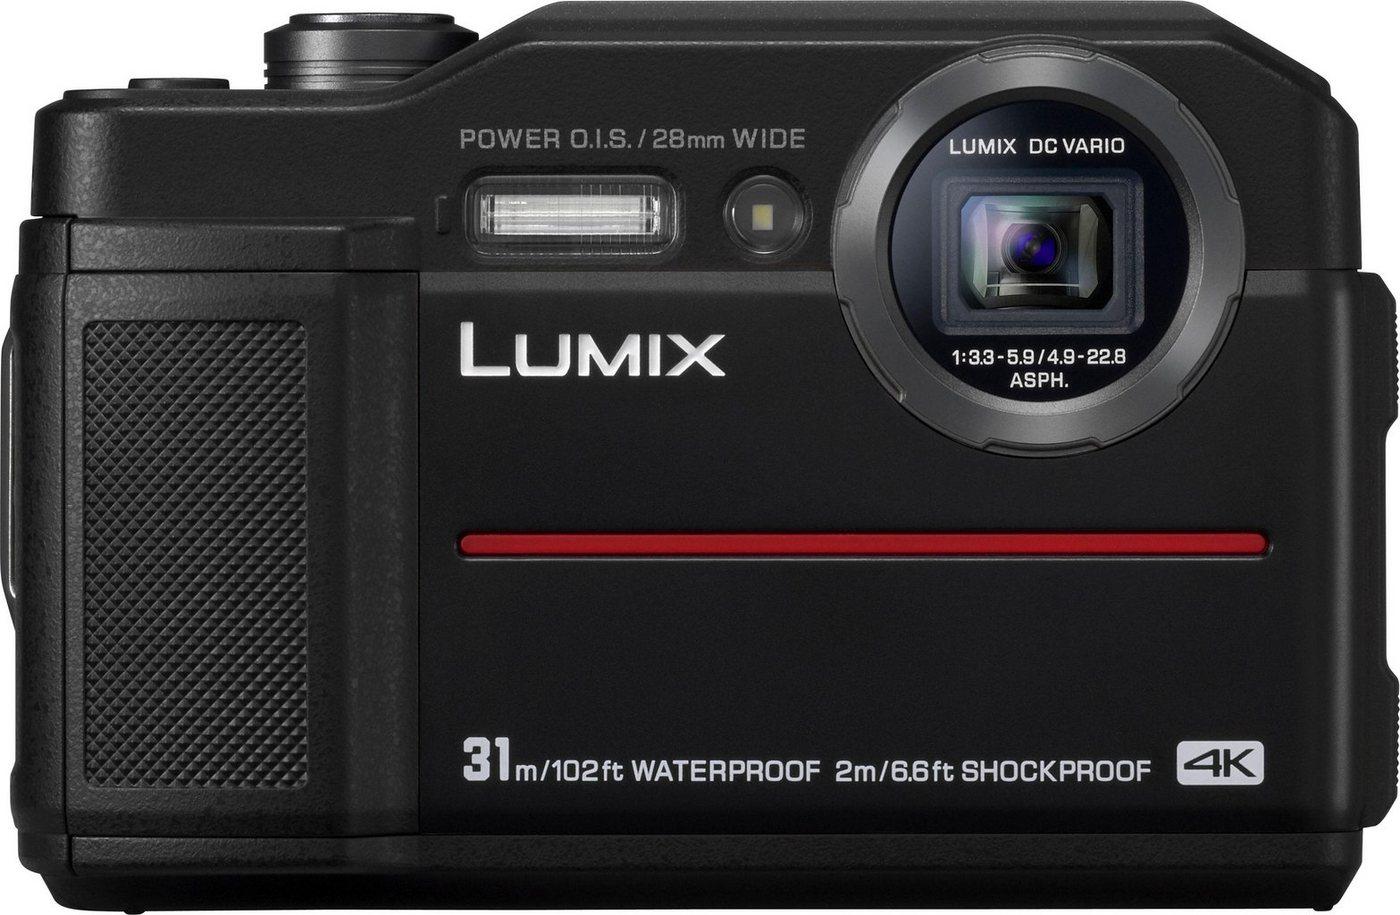 Action, Outdoorkameras - Lumix Panasonic »Lumix DC FT7« Outdoor Kamera (4K Ultra HD, WLAN (Wi Fi), 4,6x opt. Zoom)  - Onlineshop OTTO